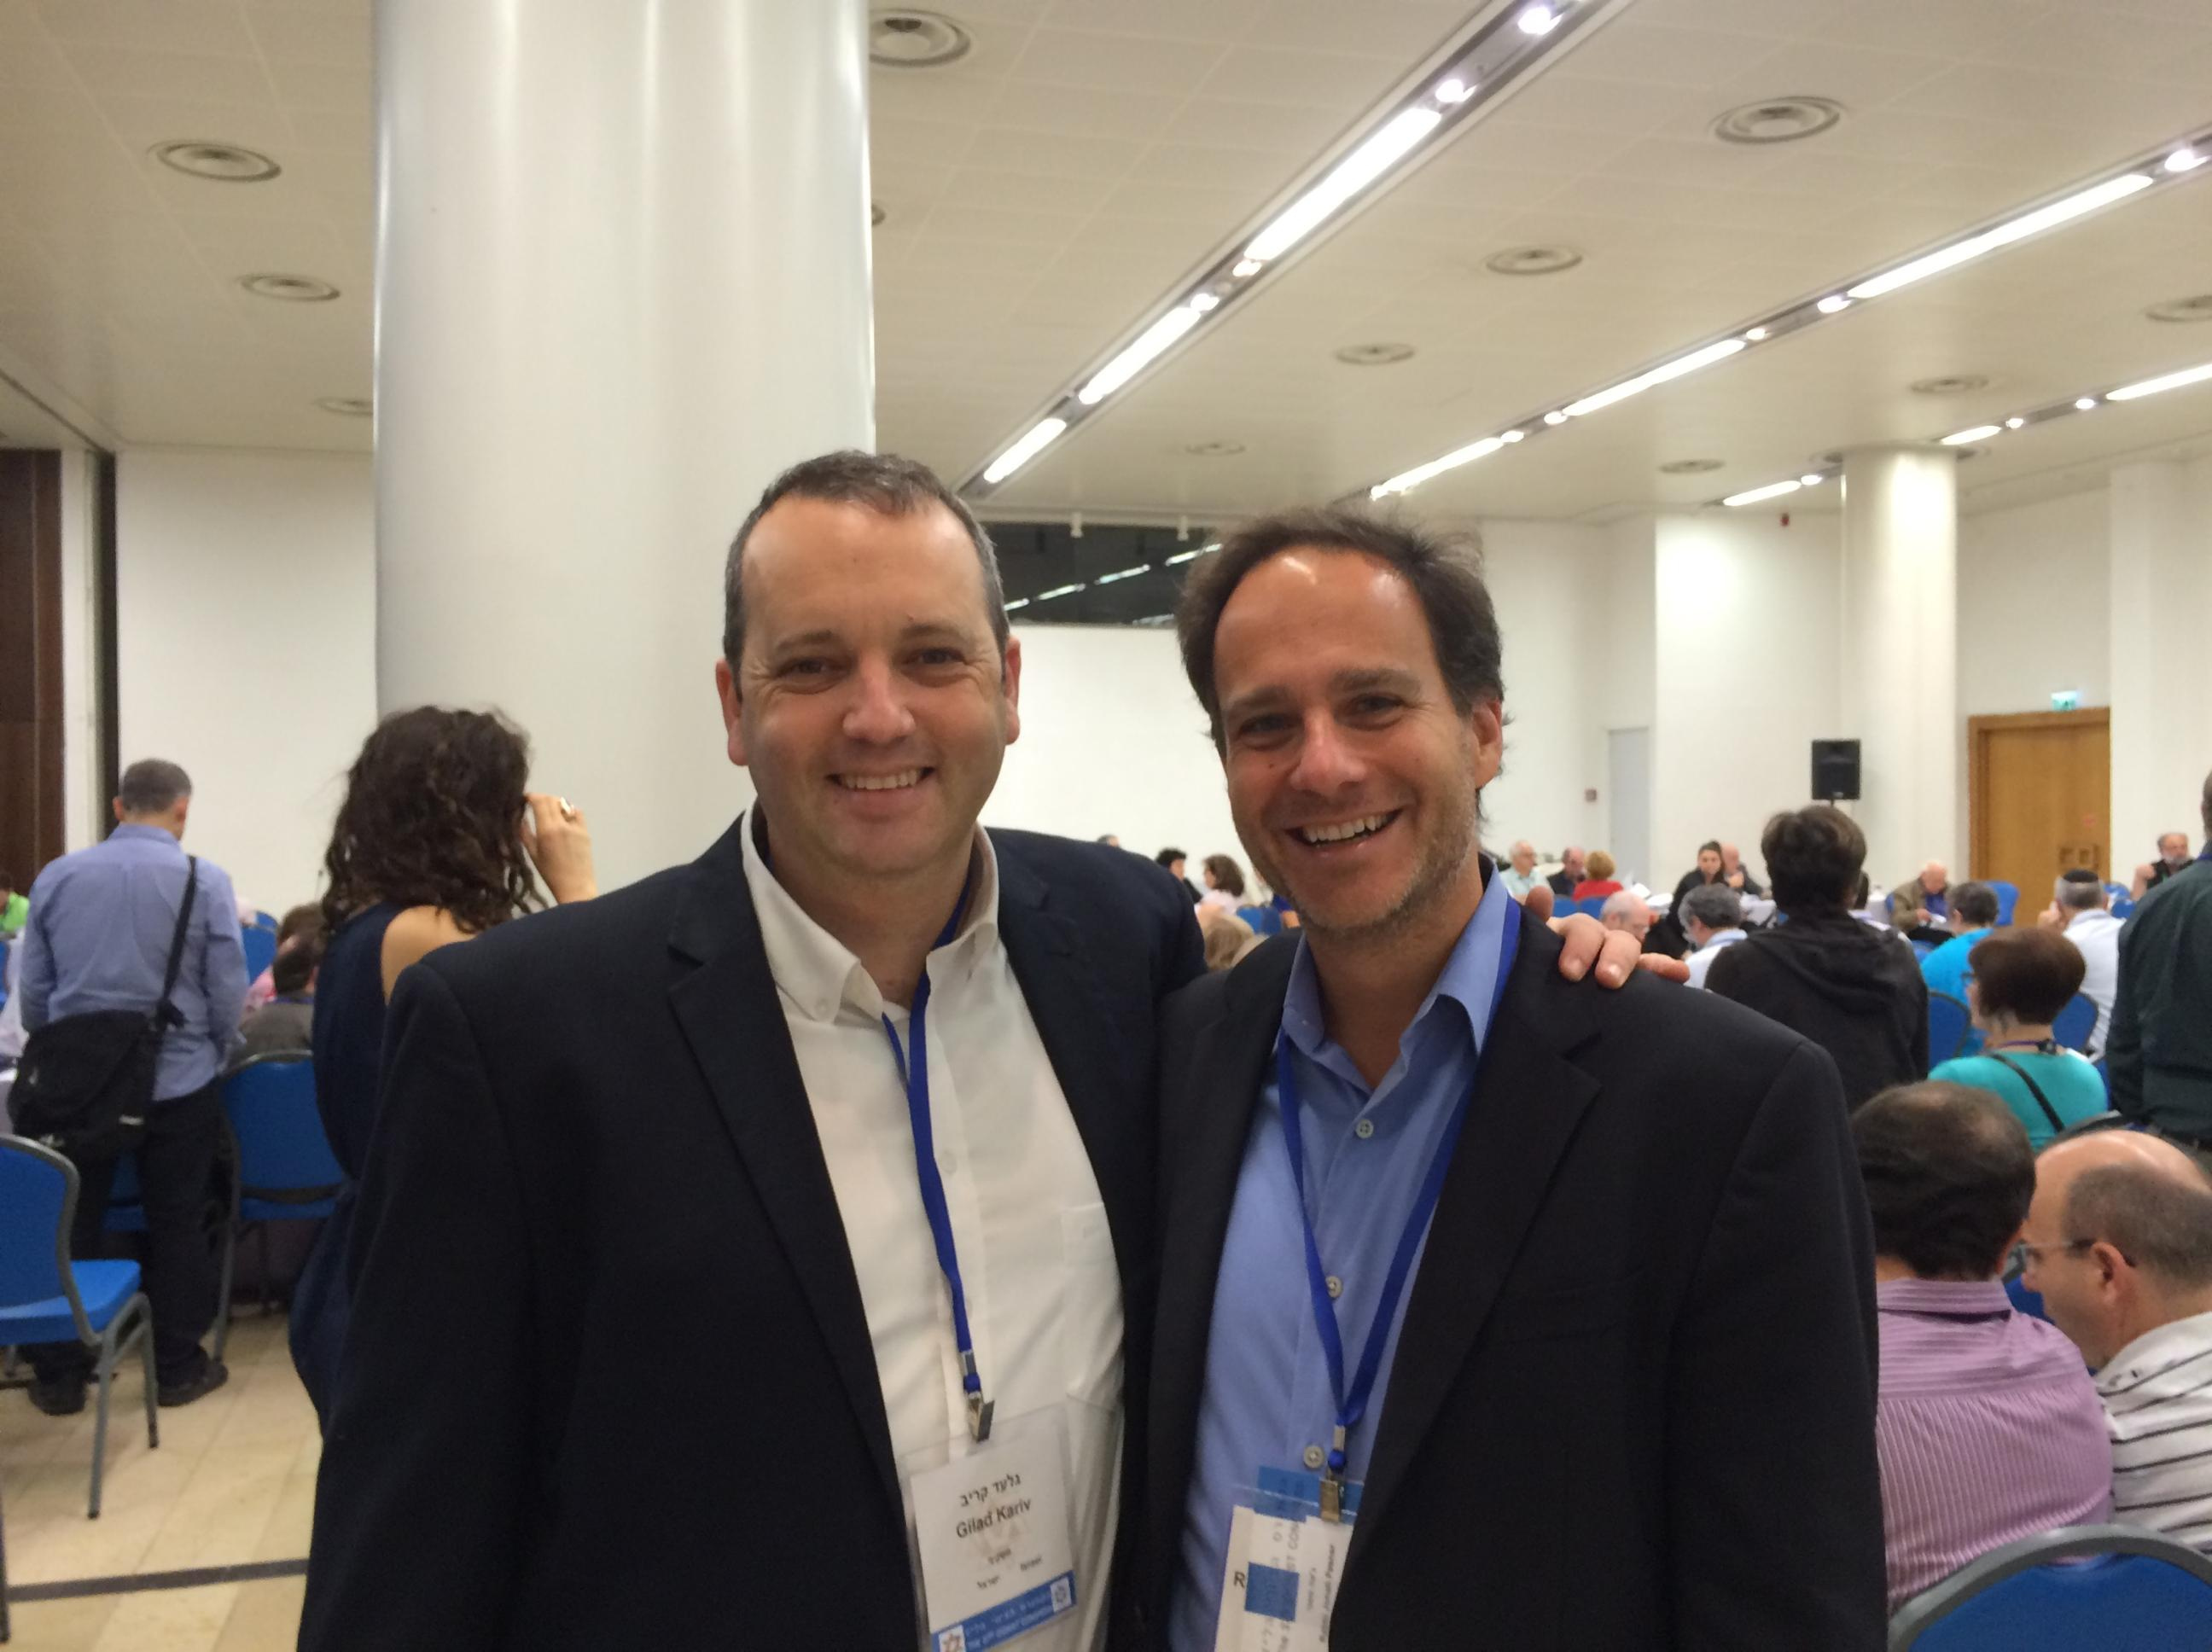 RAC Director Rabbi Jonah Dov Pesner with IMPJ Executive Director Gilad Kariv at the WZC